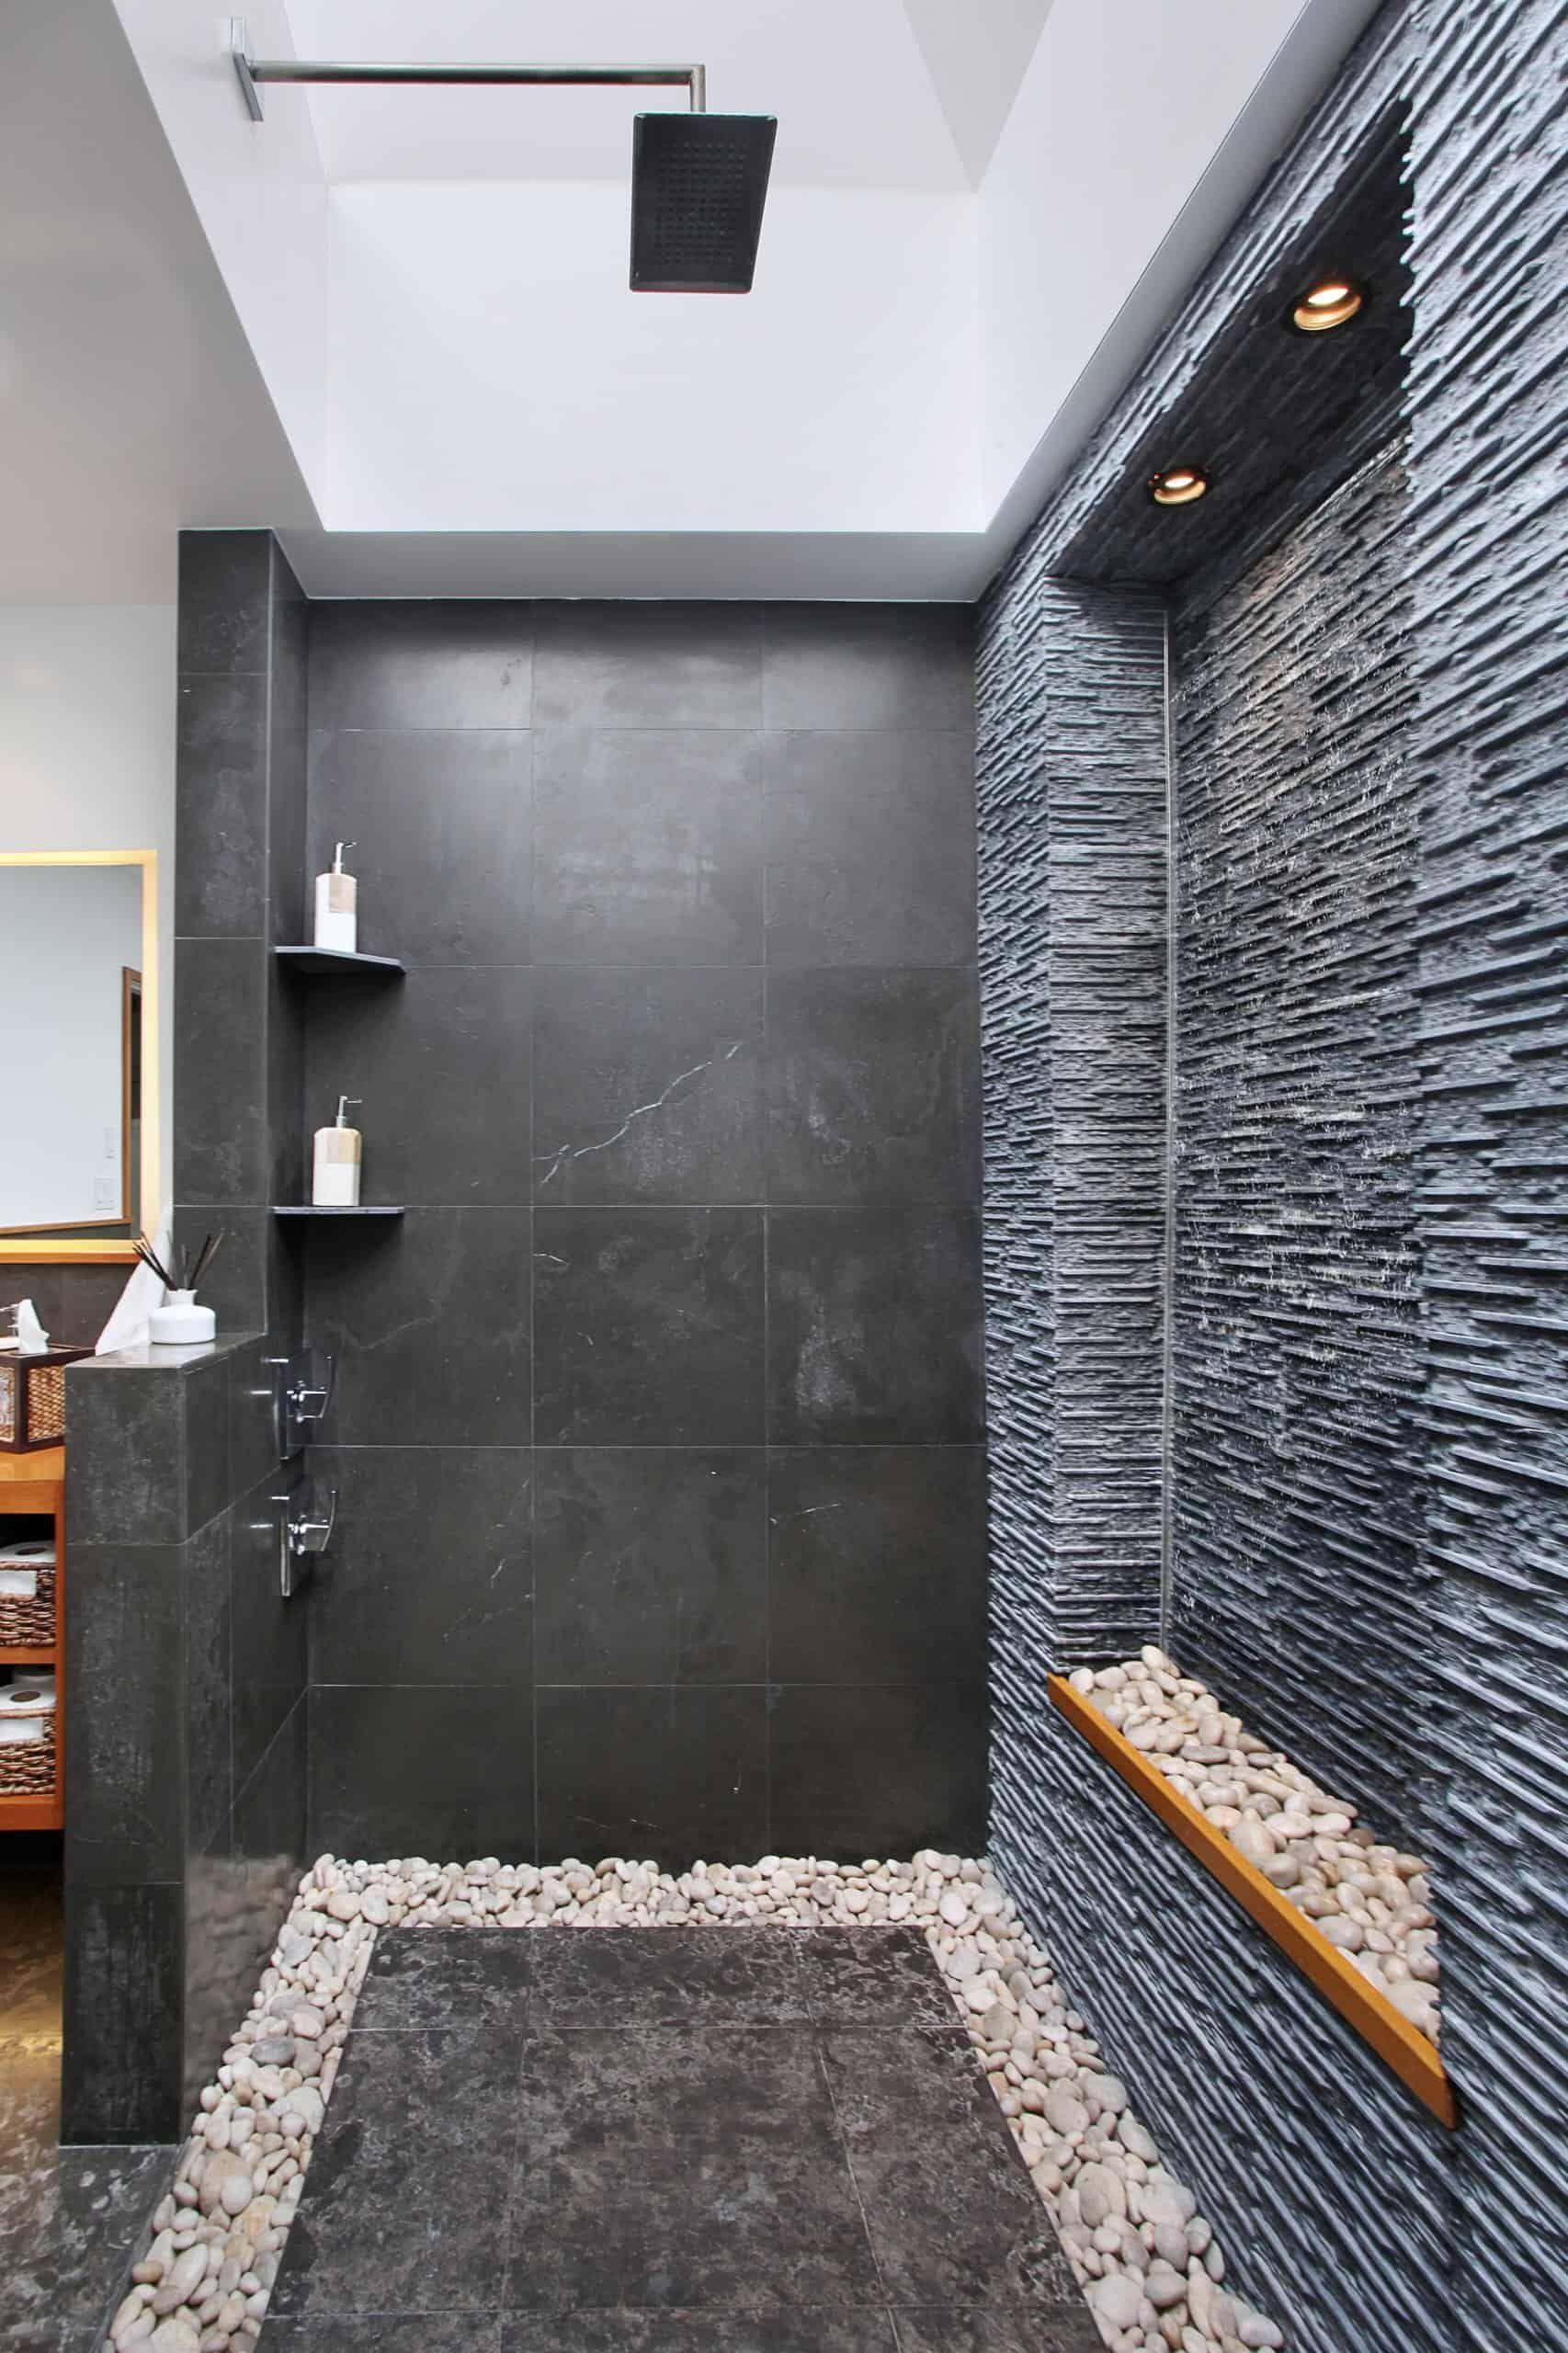 36 Doorless Walk In Shower Ideas And Designs 2020 Edition Masculine Bathroom Decor Shower Remodel Masculine Bathroom